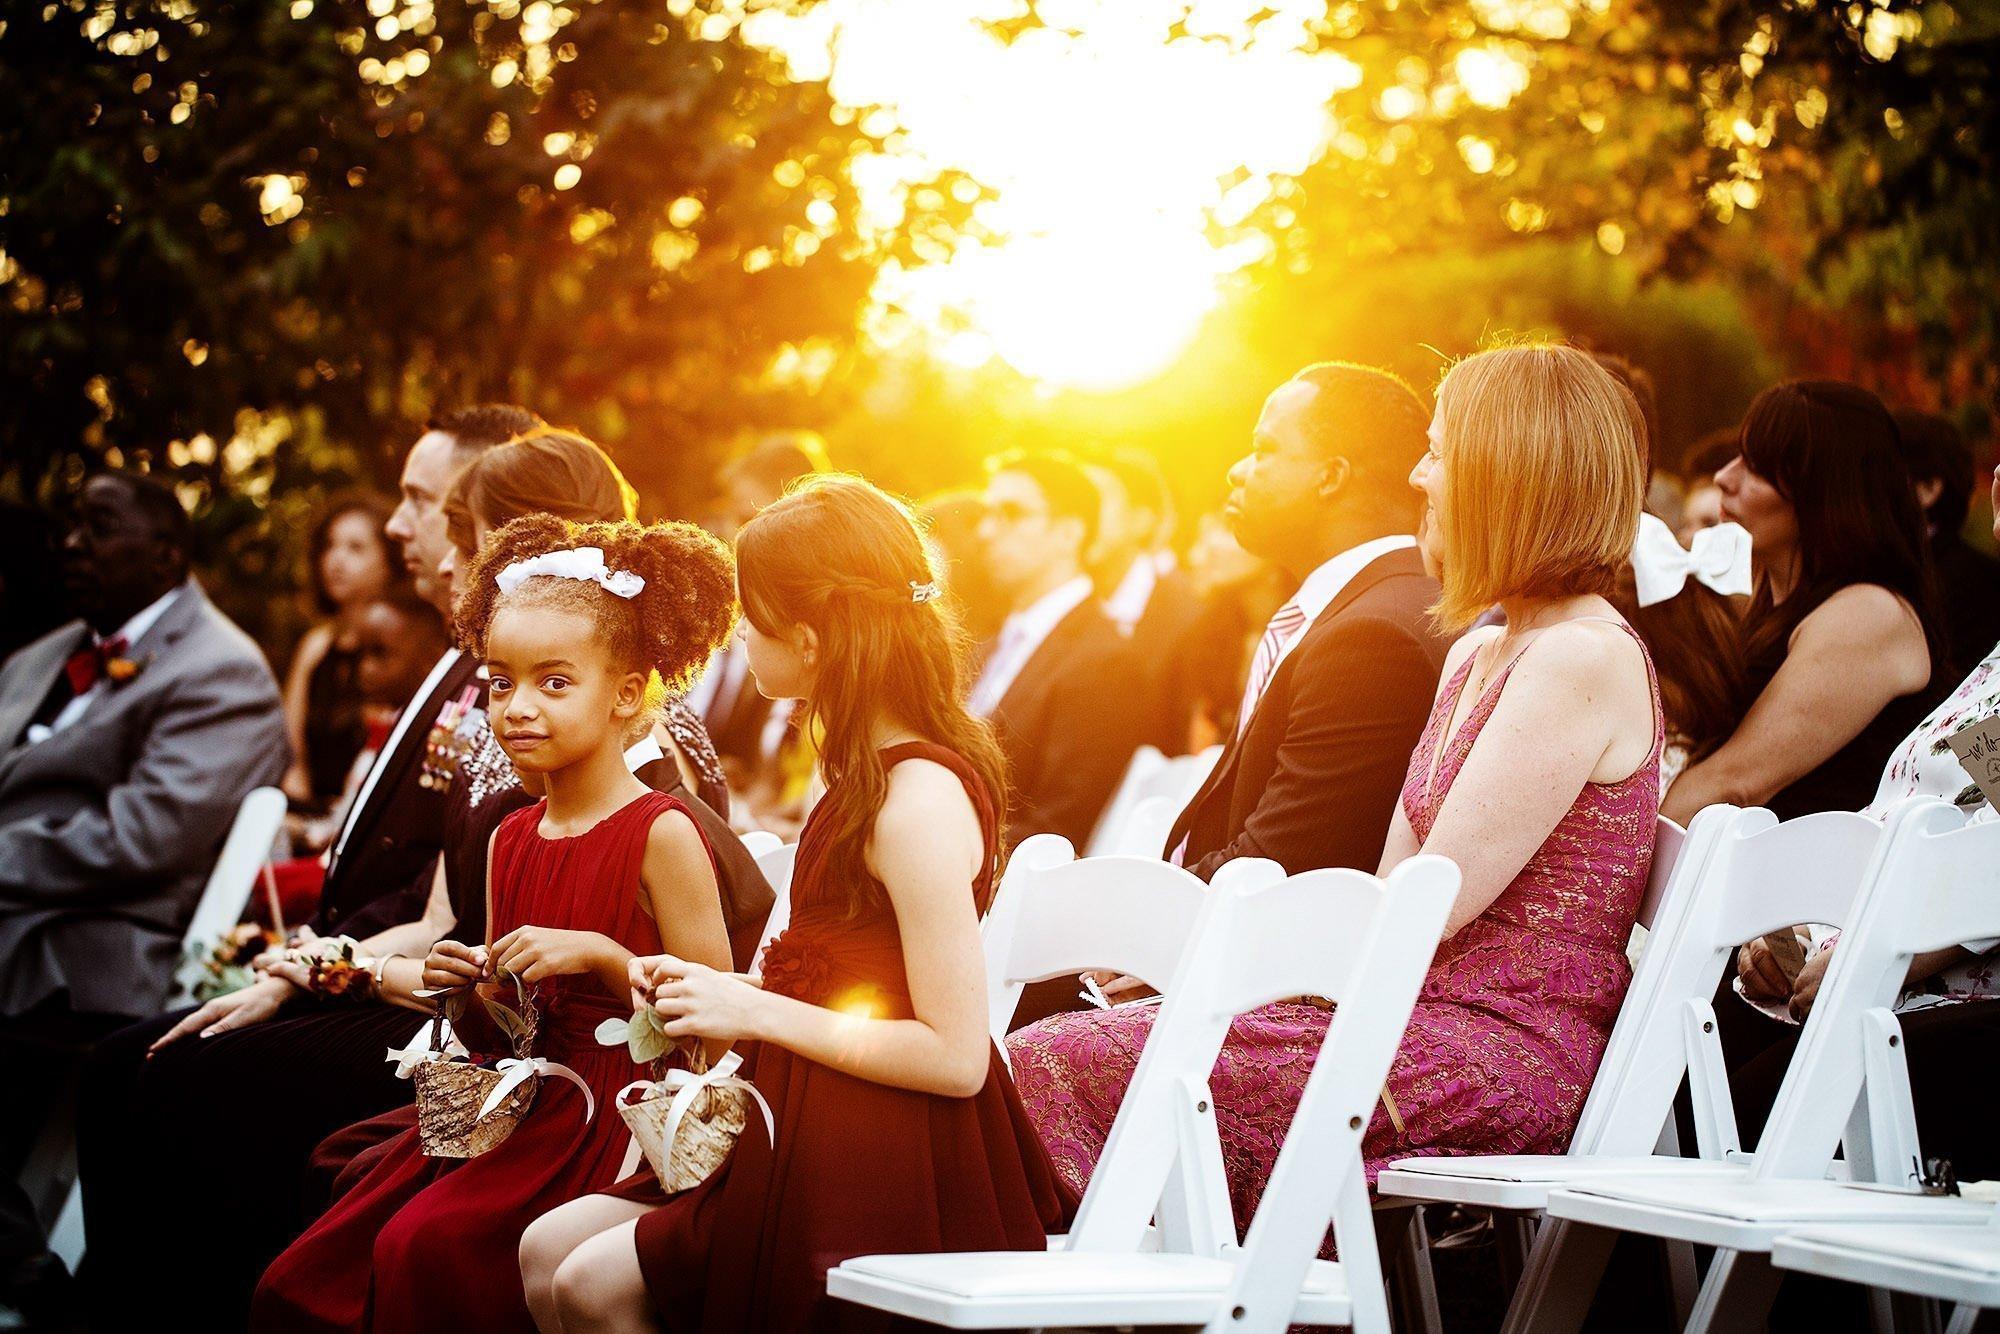 Harrington Farm Wedding  I  Flower girls watch the ceremony during sunset in Princeton, MA.